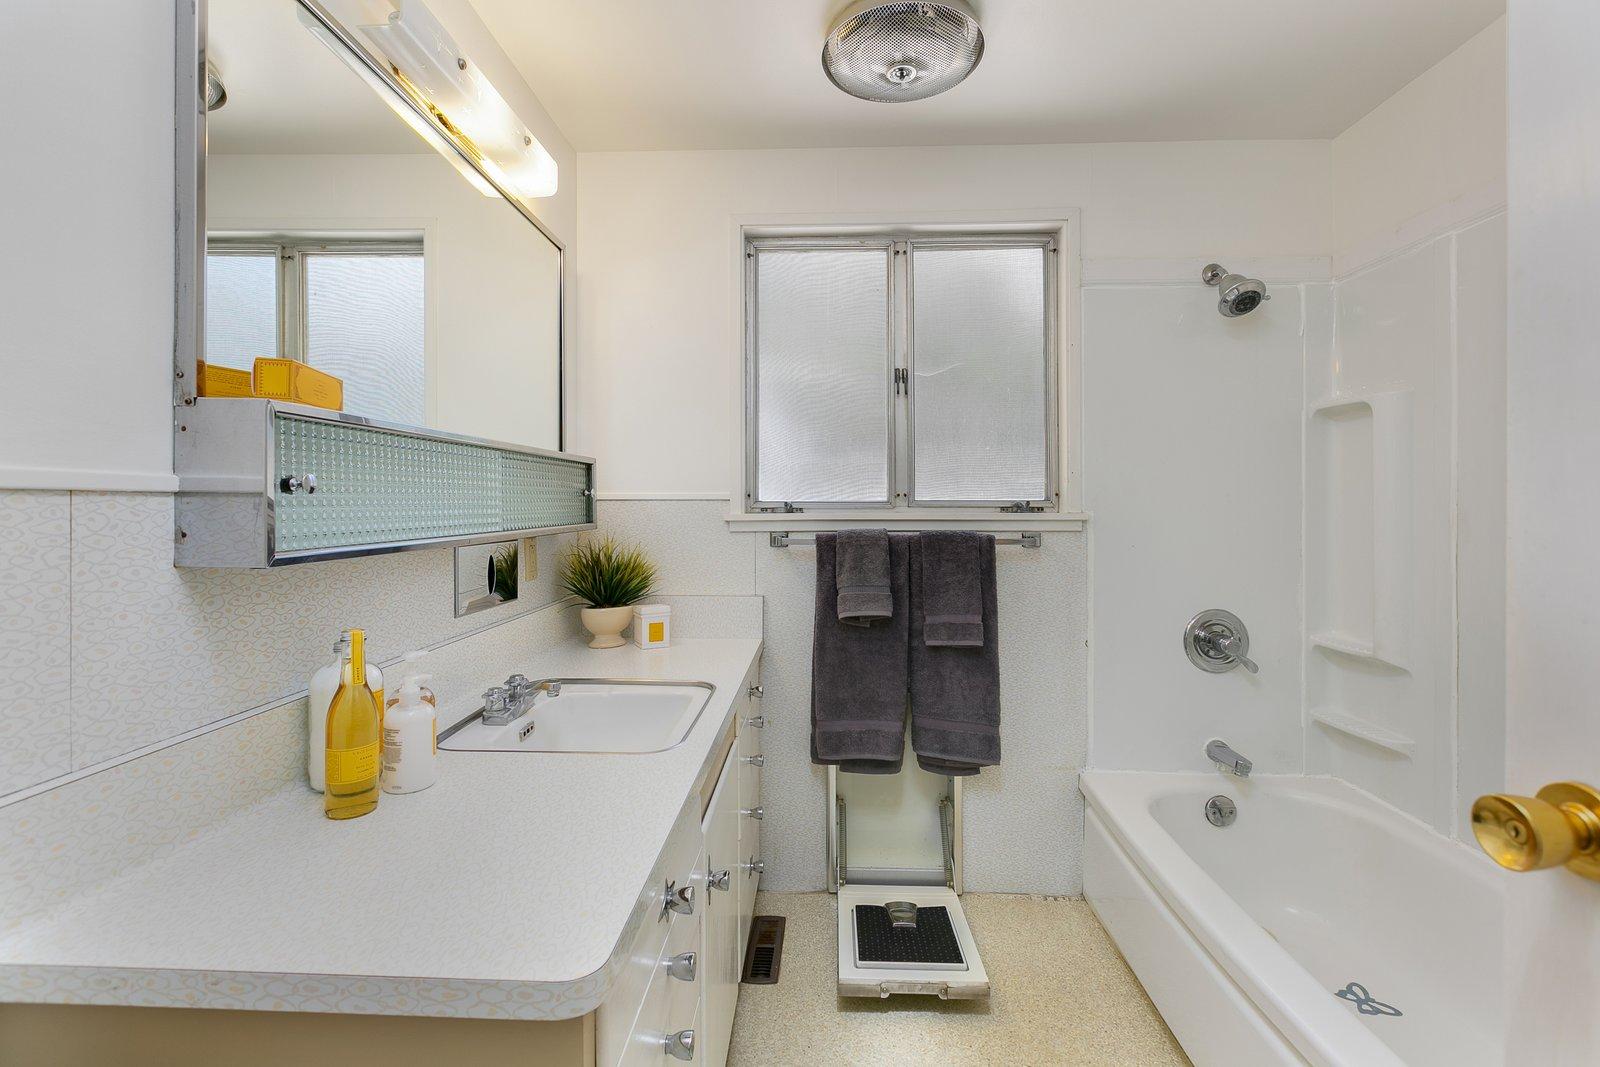 1960 PCC Case Study House #11 bathroom